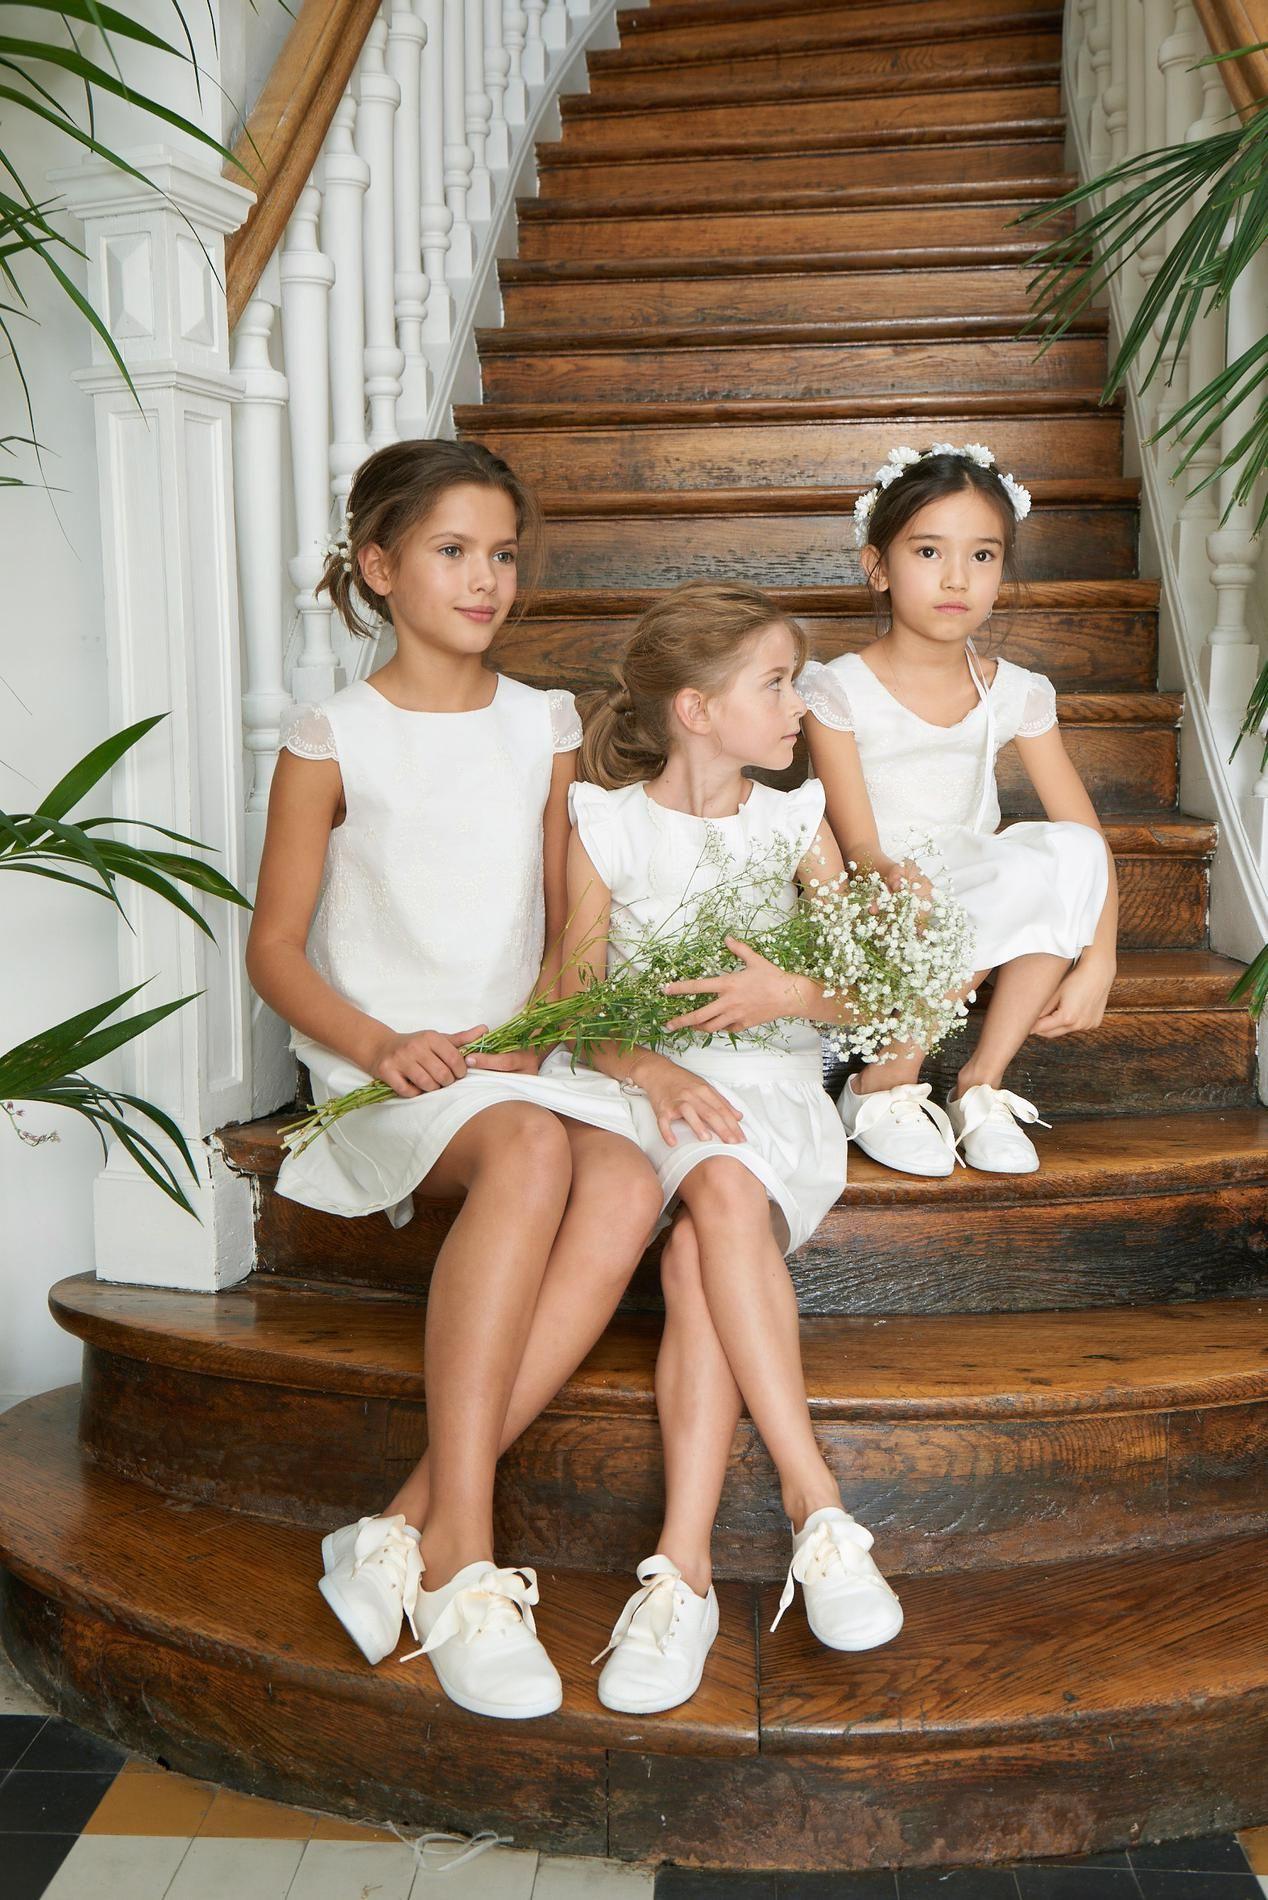 Jacadi Bonpoint Zara Jolies Tenues De Cortege Pour Enfants D Honneur Madame Figaro Robe Fillette Mariage Cortege Mariage Robe Enfant Mariage